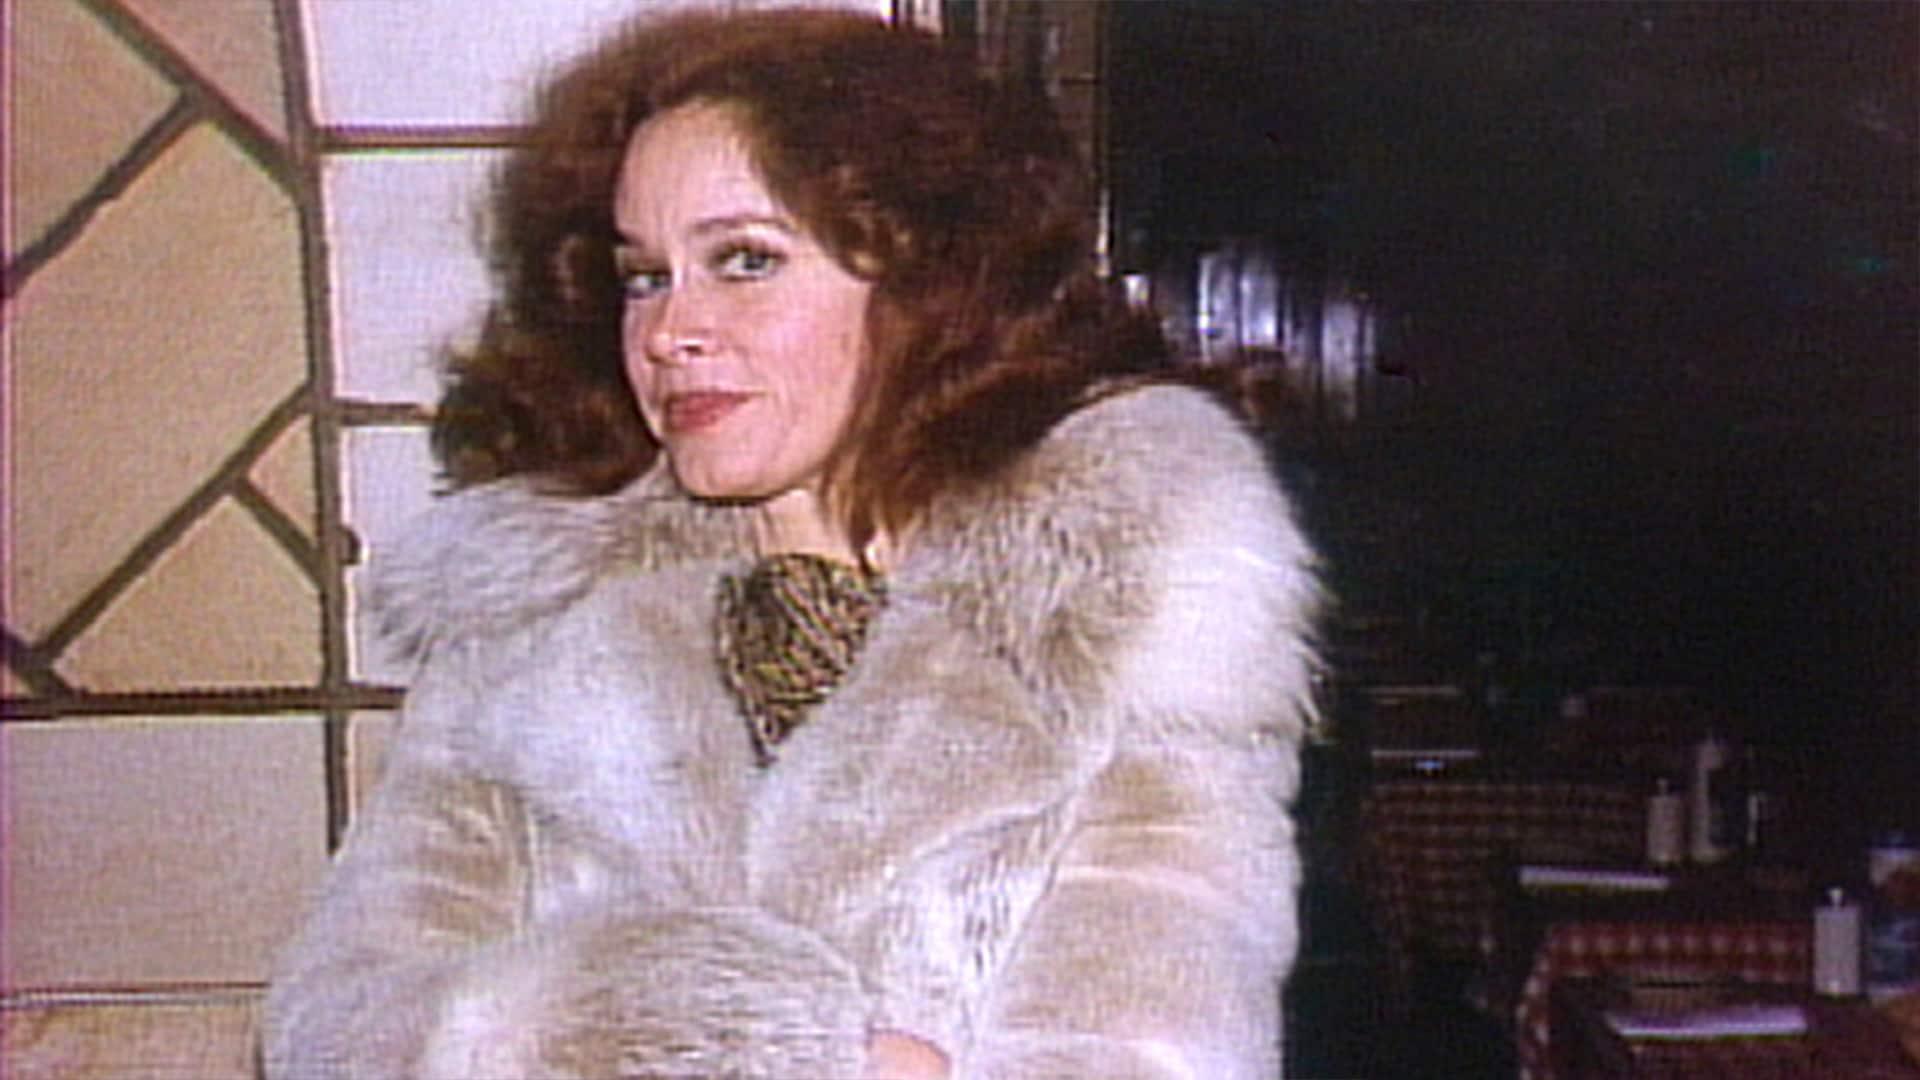 Karen Black: January, 17, 1981